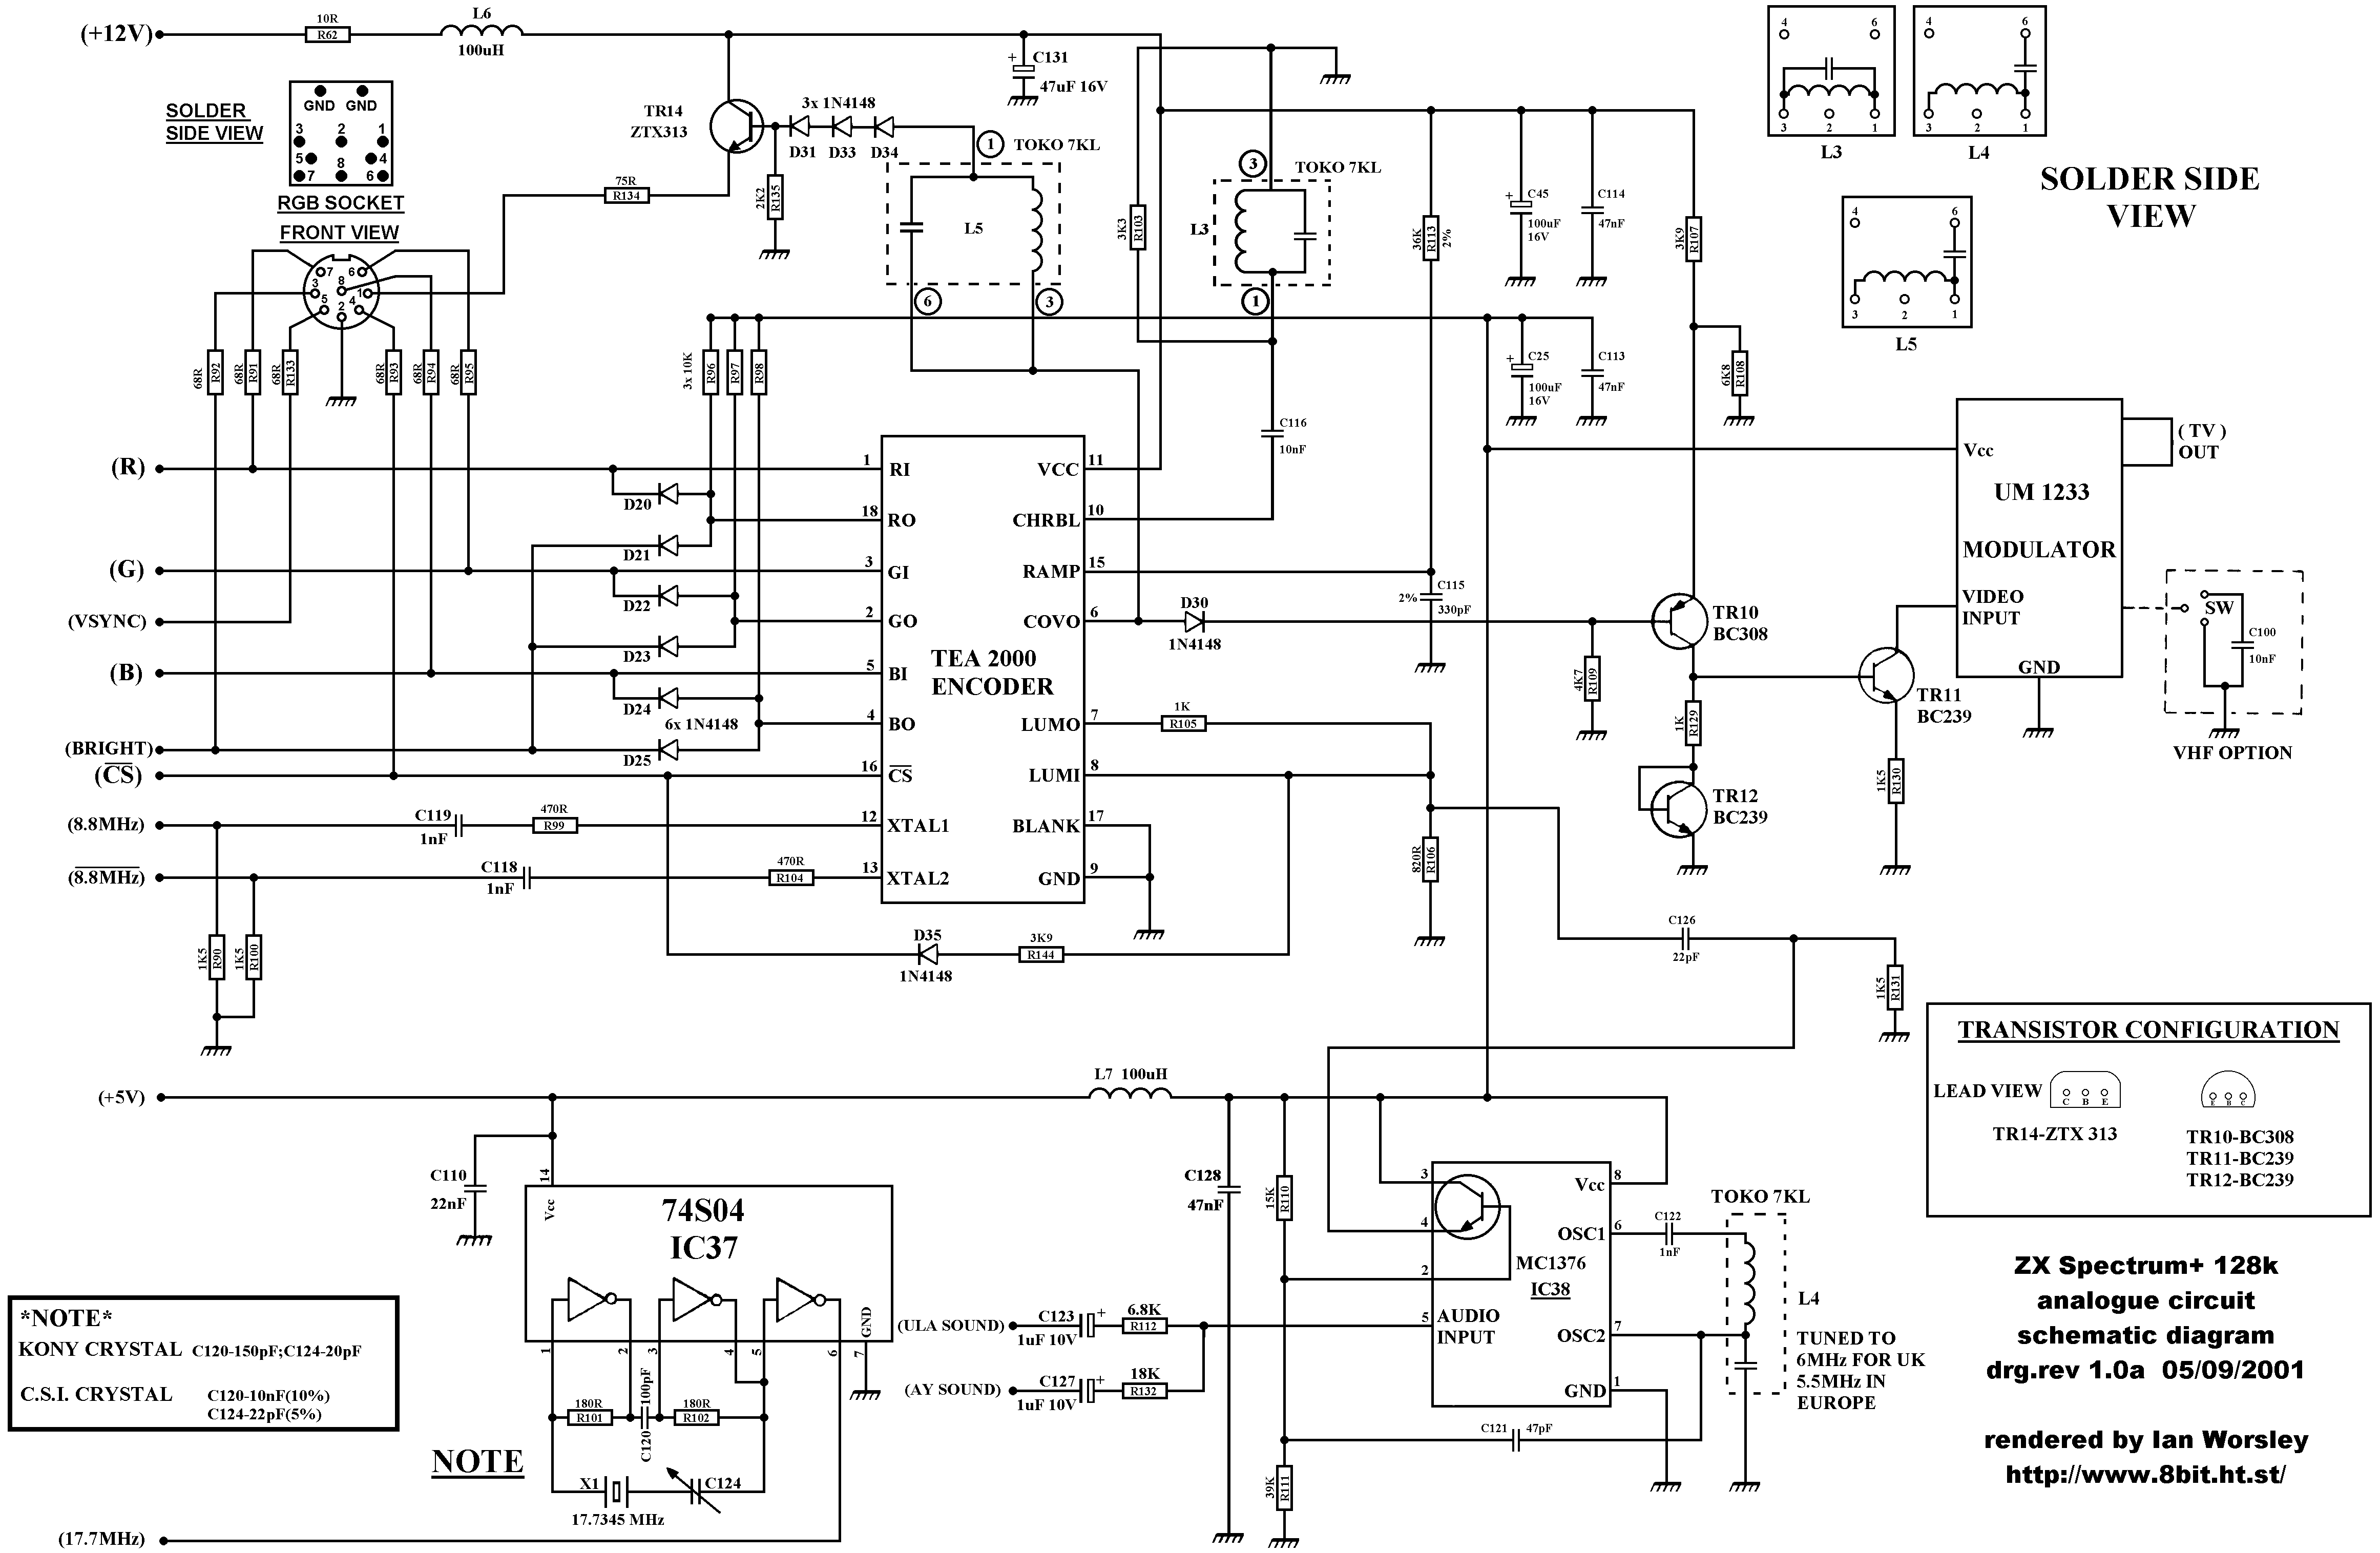 diode schematic diagram